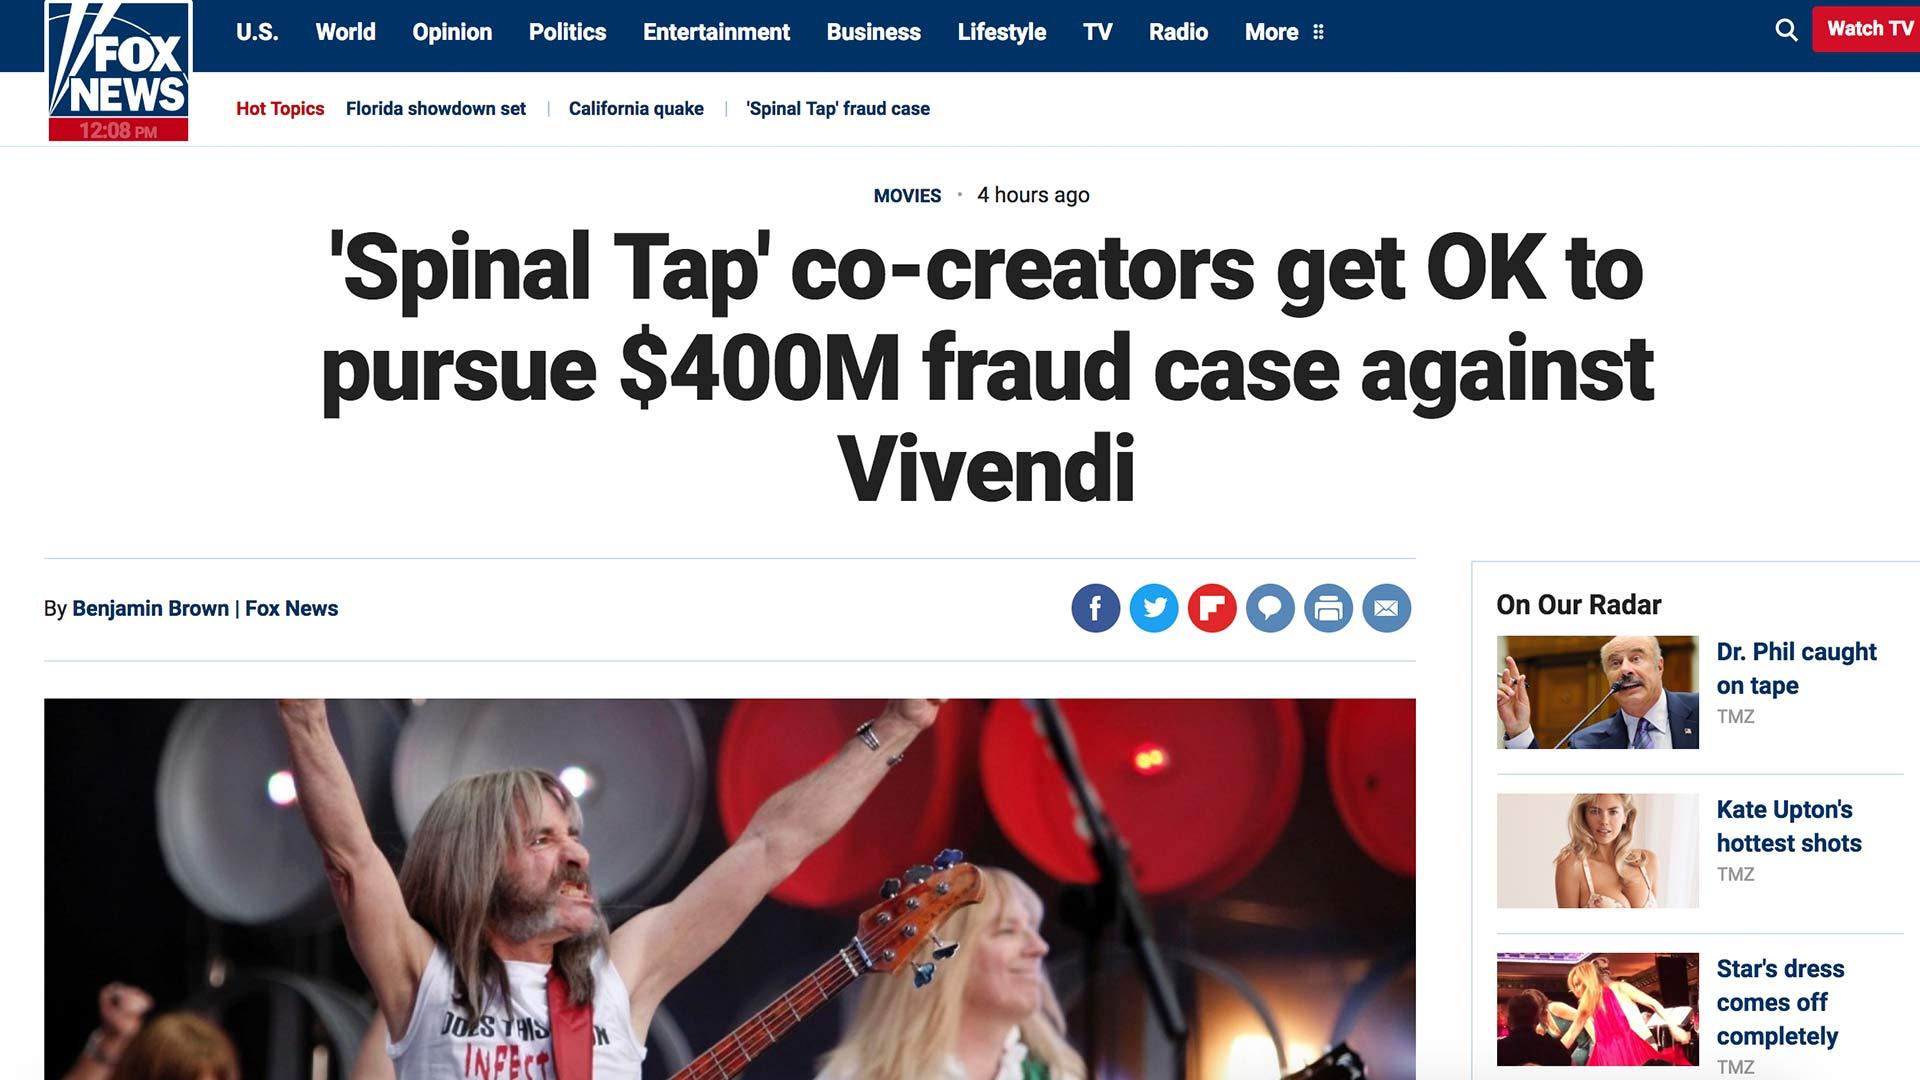 Fairness Rocks News 'Spinal Tap' co-creators get OK to pursue $400M fraud case against Vivendi